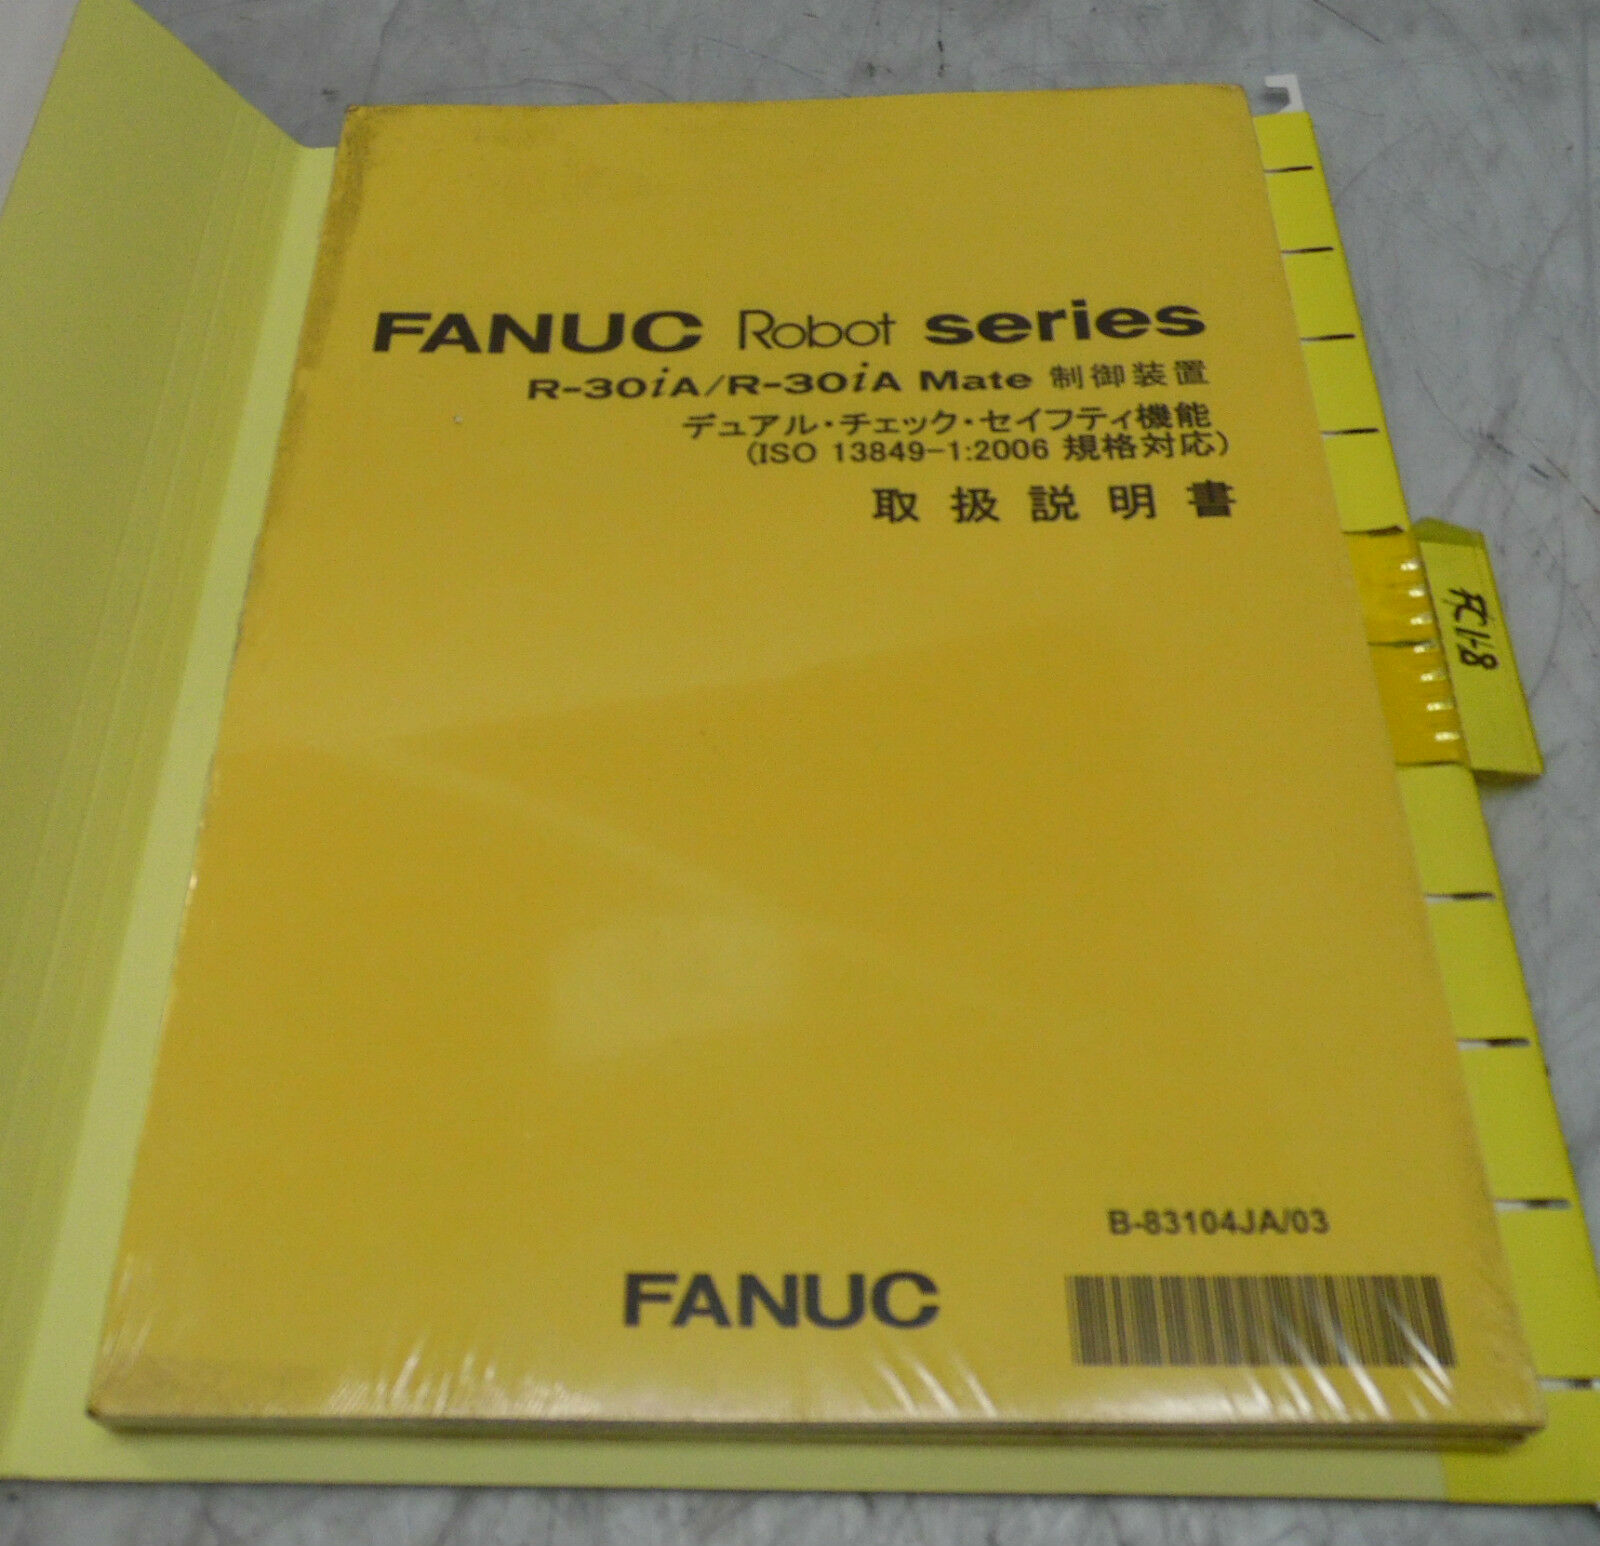 NEW Fanuc Robot Series R-30iA   R-30iA Mate Manual, Japanese, B-82974JA 01